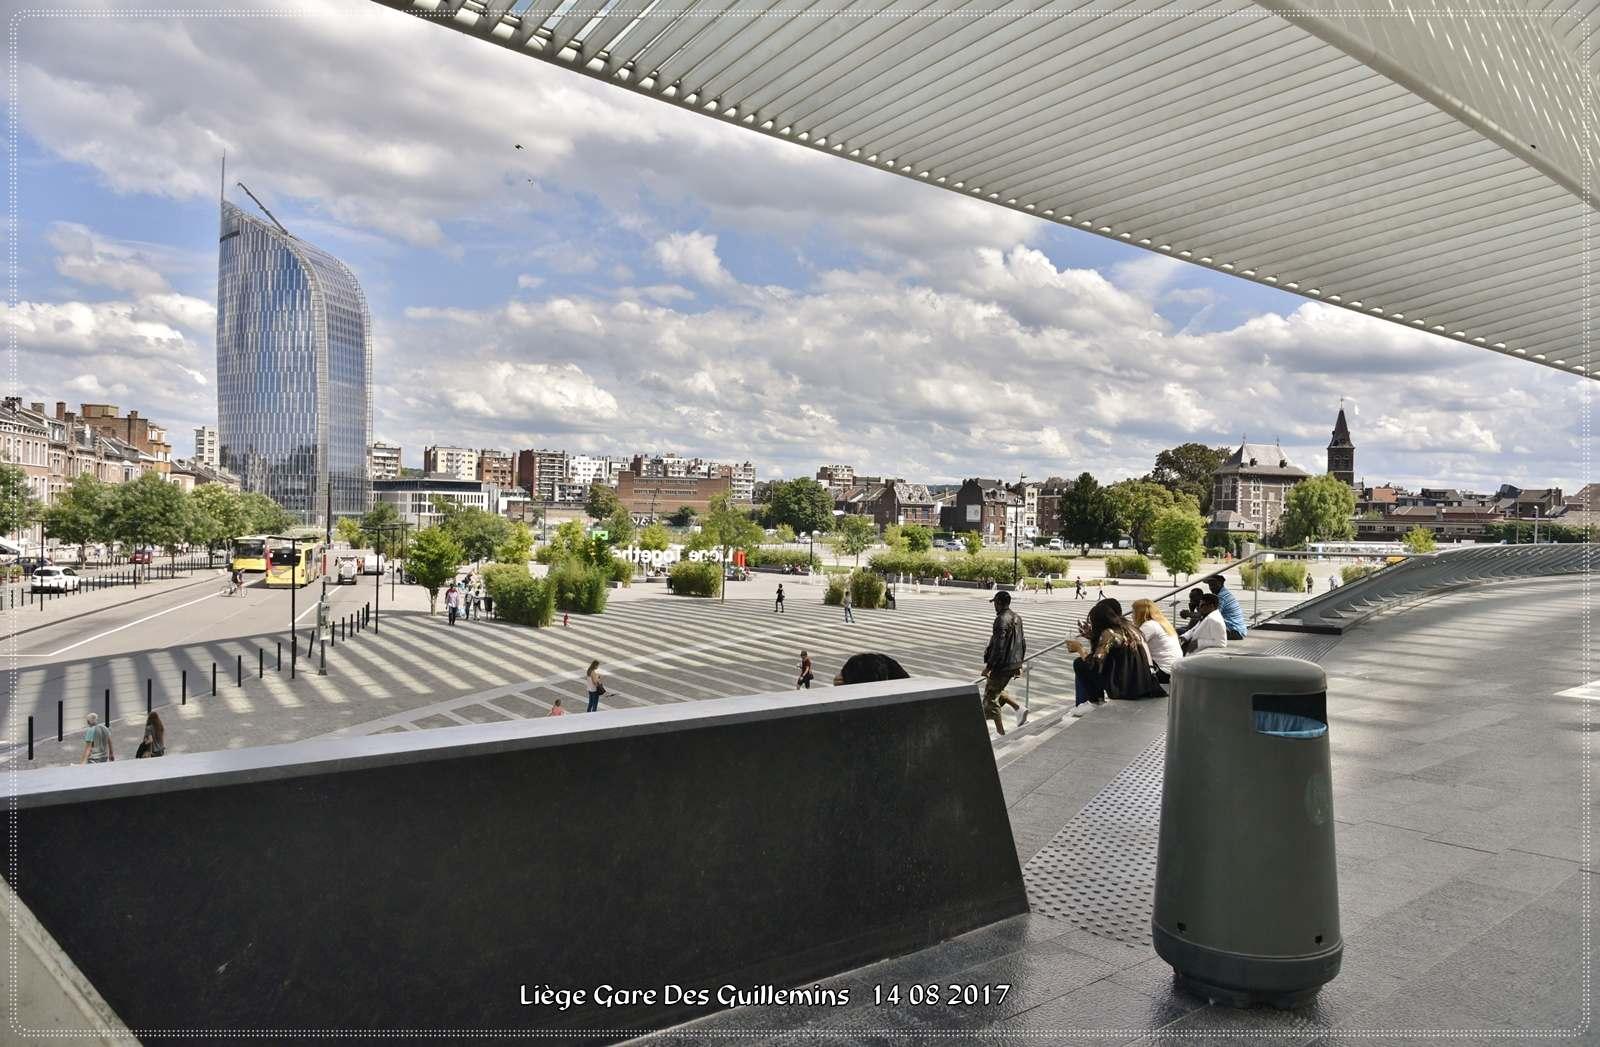 gare des guillemins6 Liege Guillemins Railway Station by Santiago Calatrava